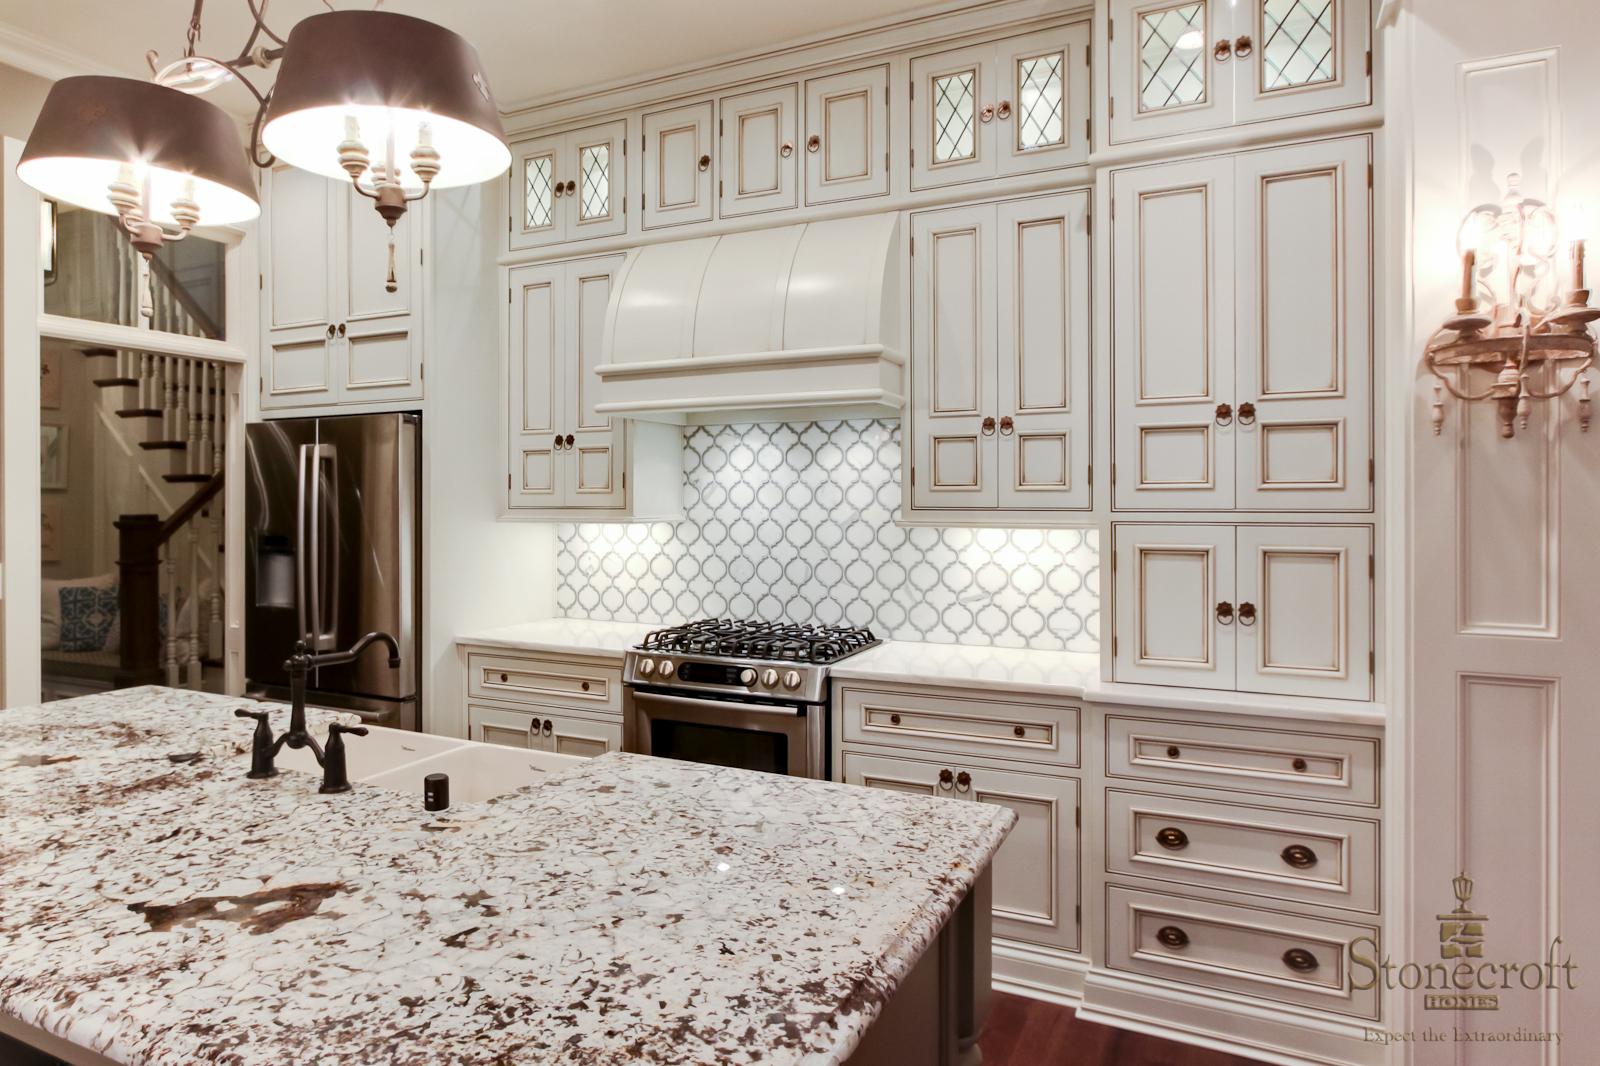 Kitchen backsplash dailygadgetfo Choice Image